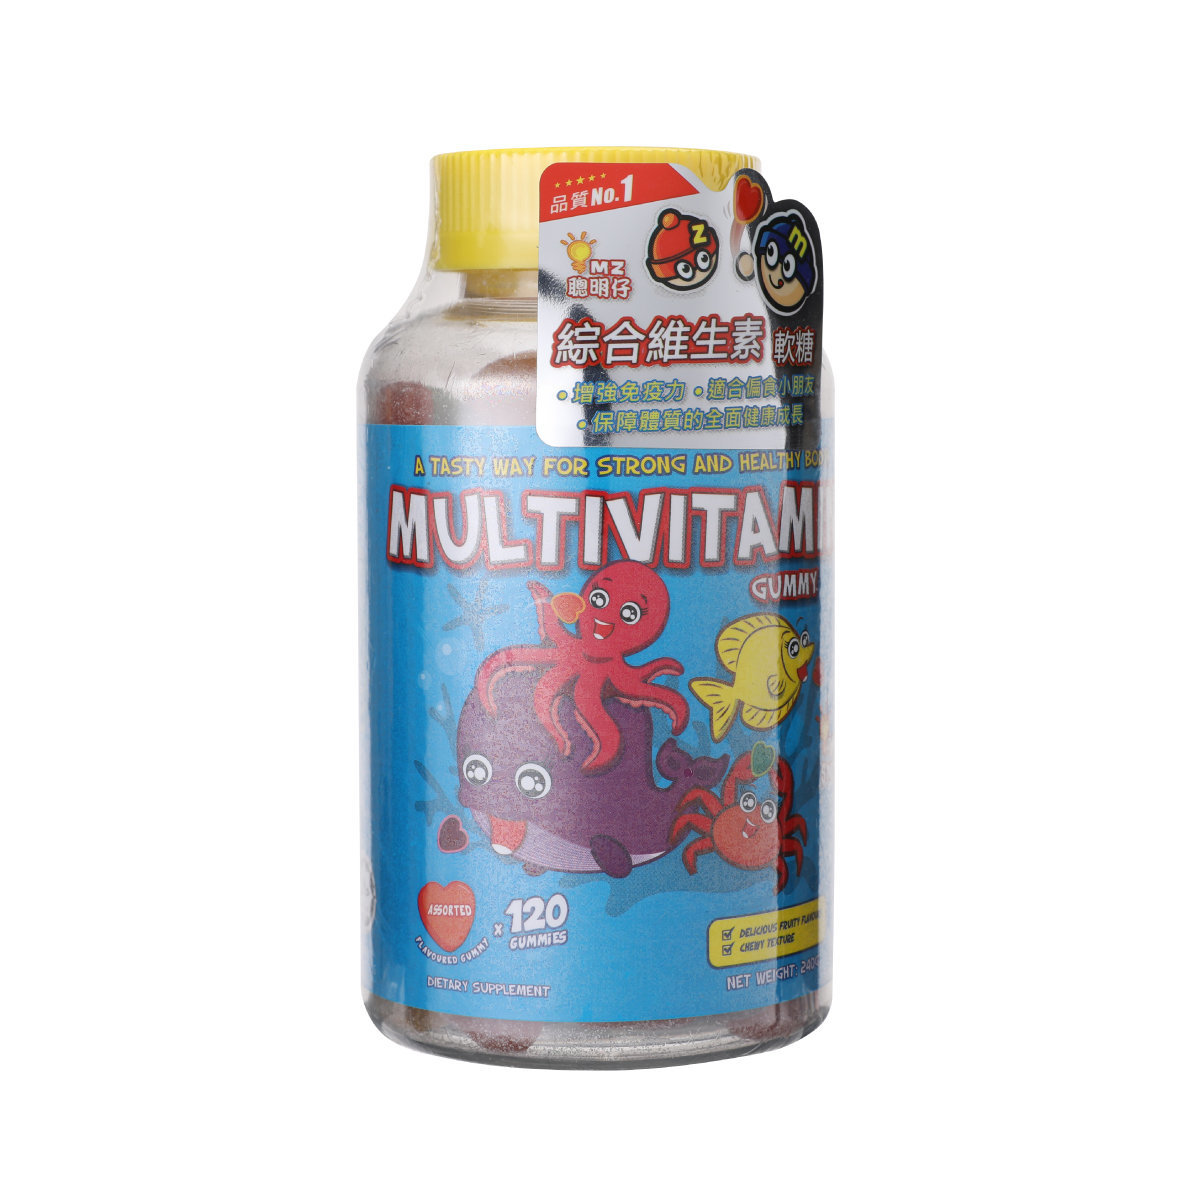 MZ SMART MULTIVITAMIN GUMMY 120'S